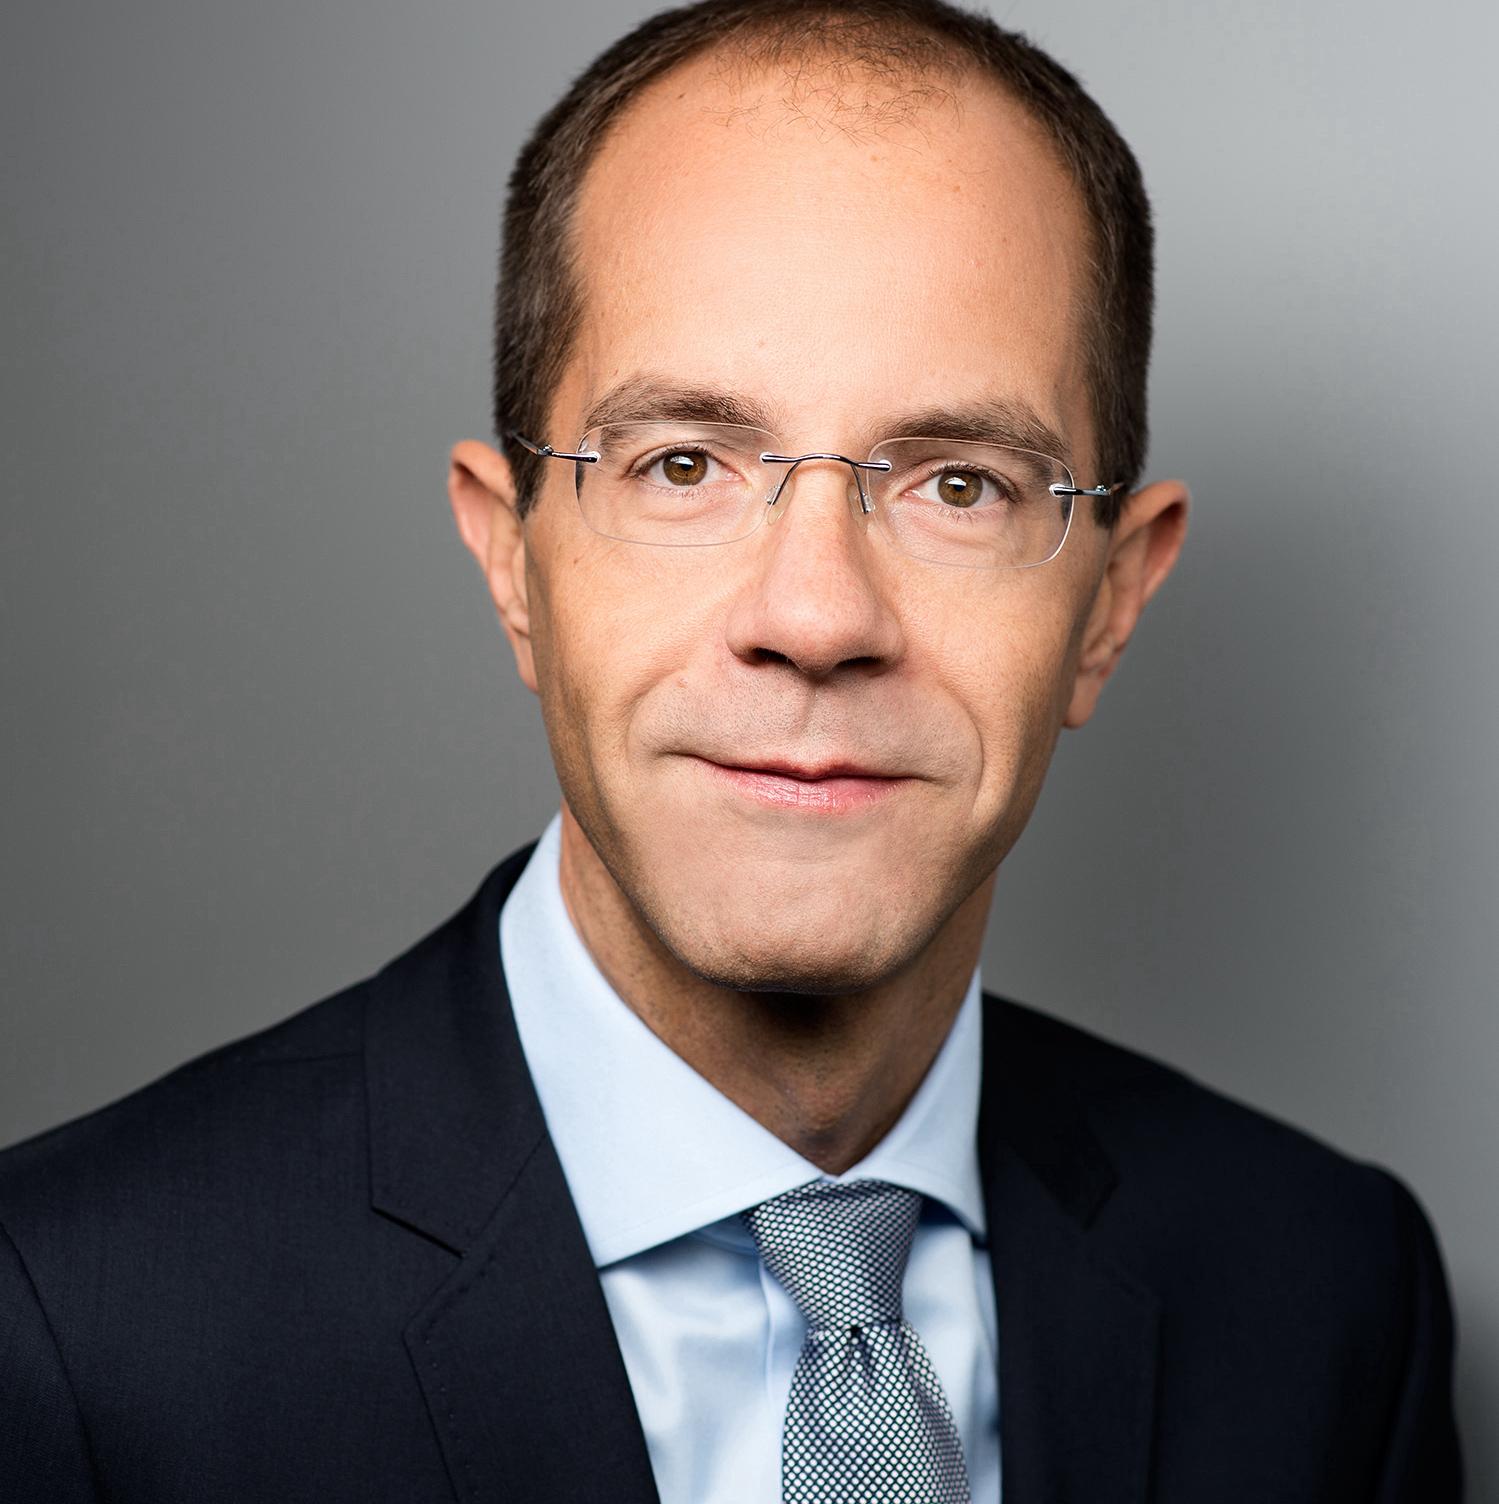 Christian Gräff